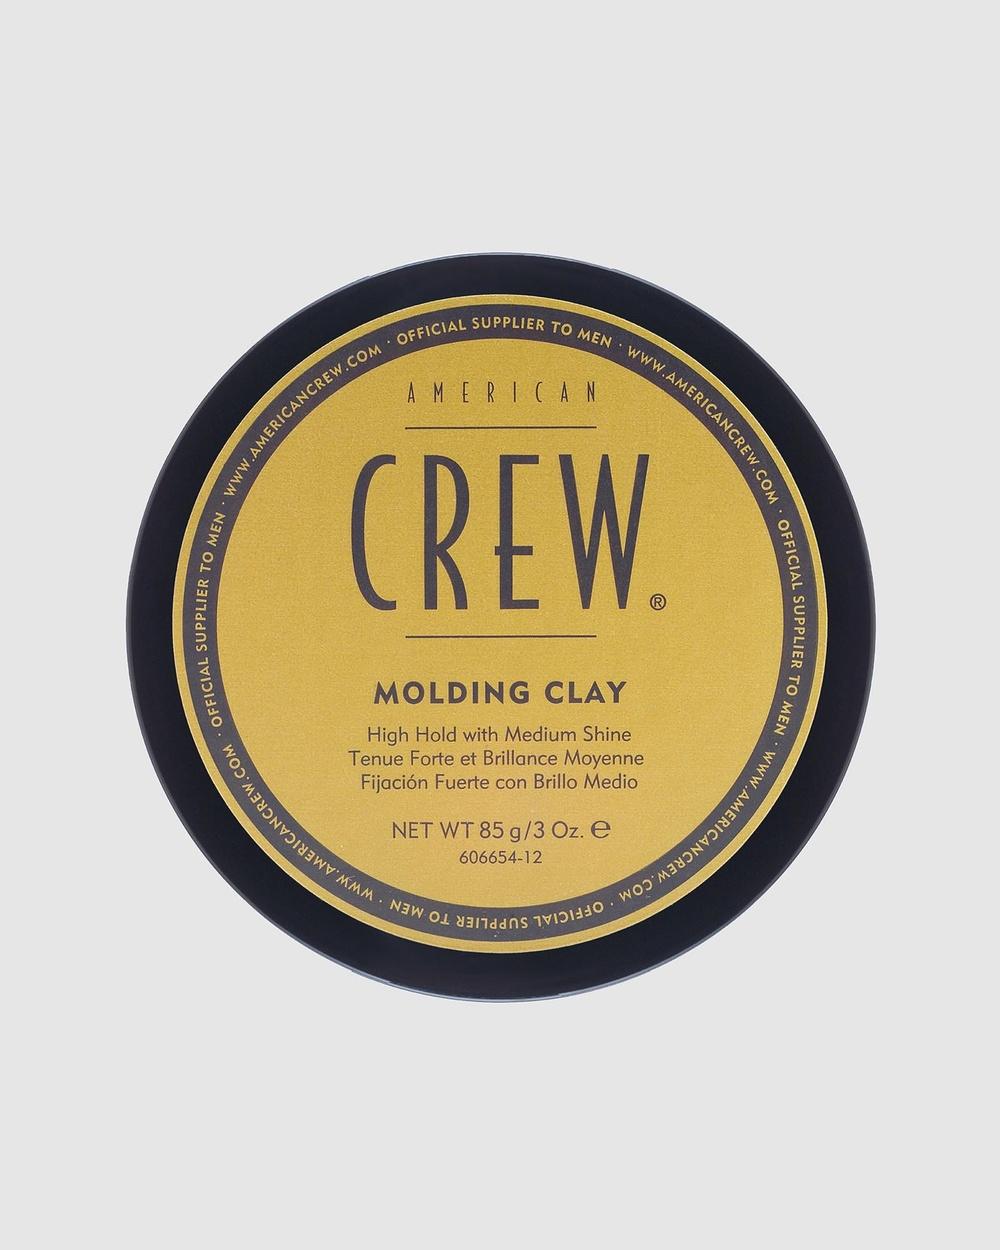 American Crew Classic Molding Clay 3oz 85g Beauty Brown & Black 3oz-85g